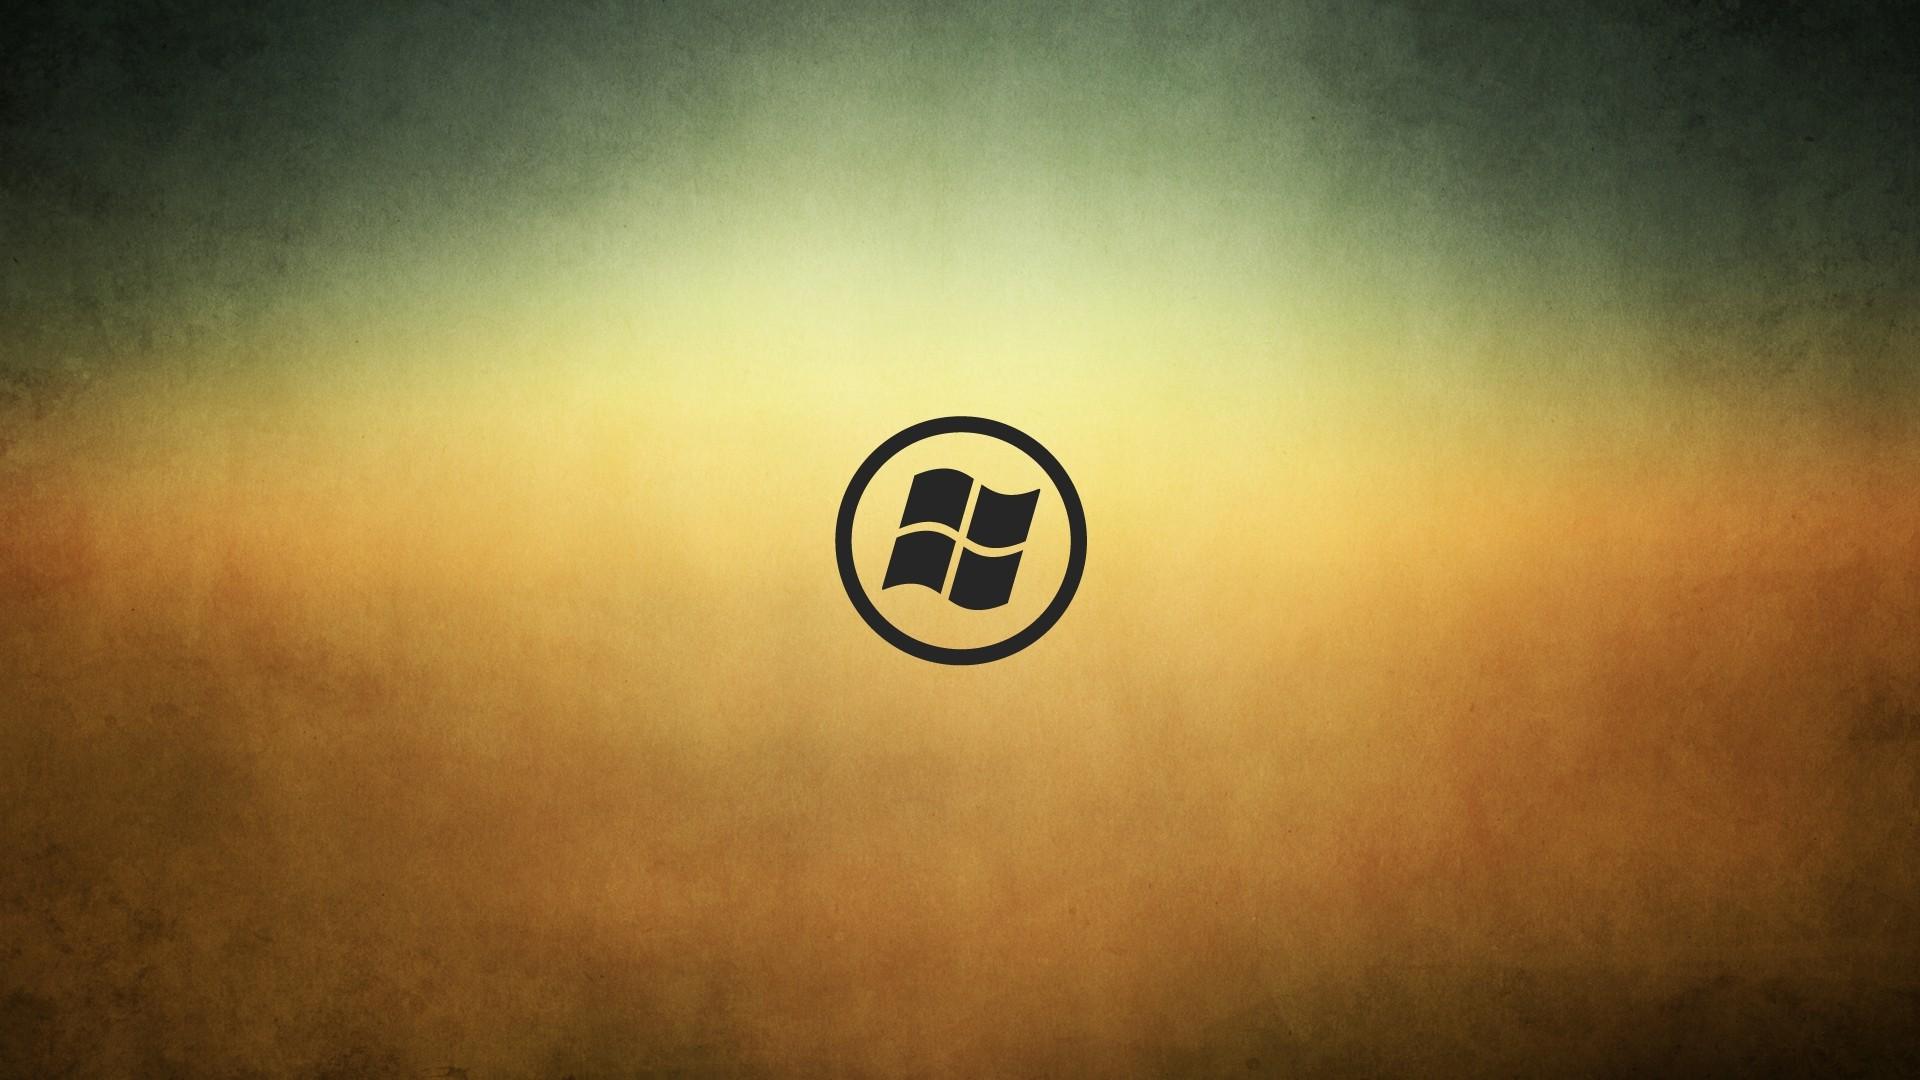 Minimalistic Windows 7 Windows XP flags basic Microsoft